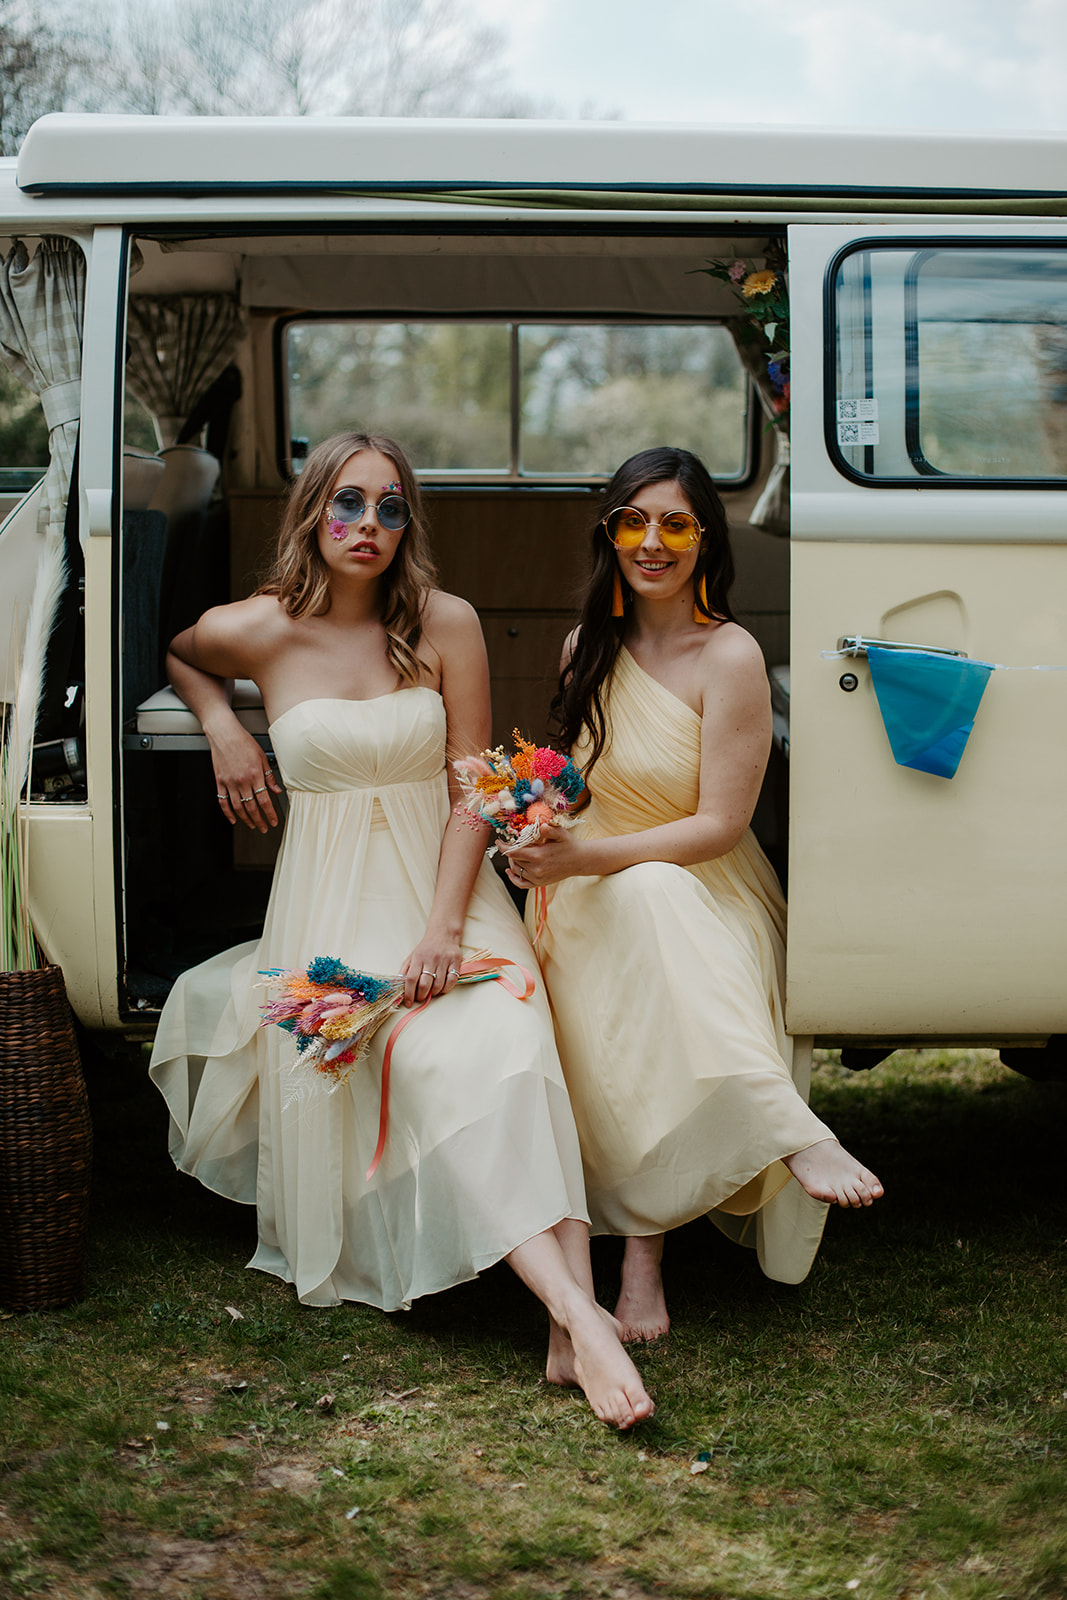 camper van wedding - camper van photo booth - fun wedding photos - bridesmaids in camper van